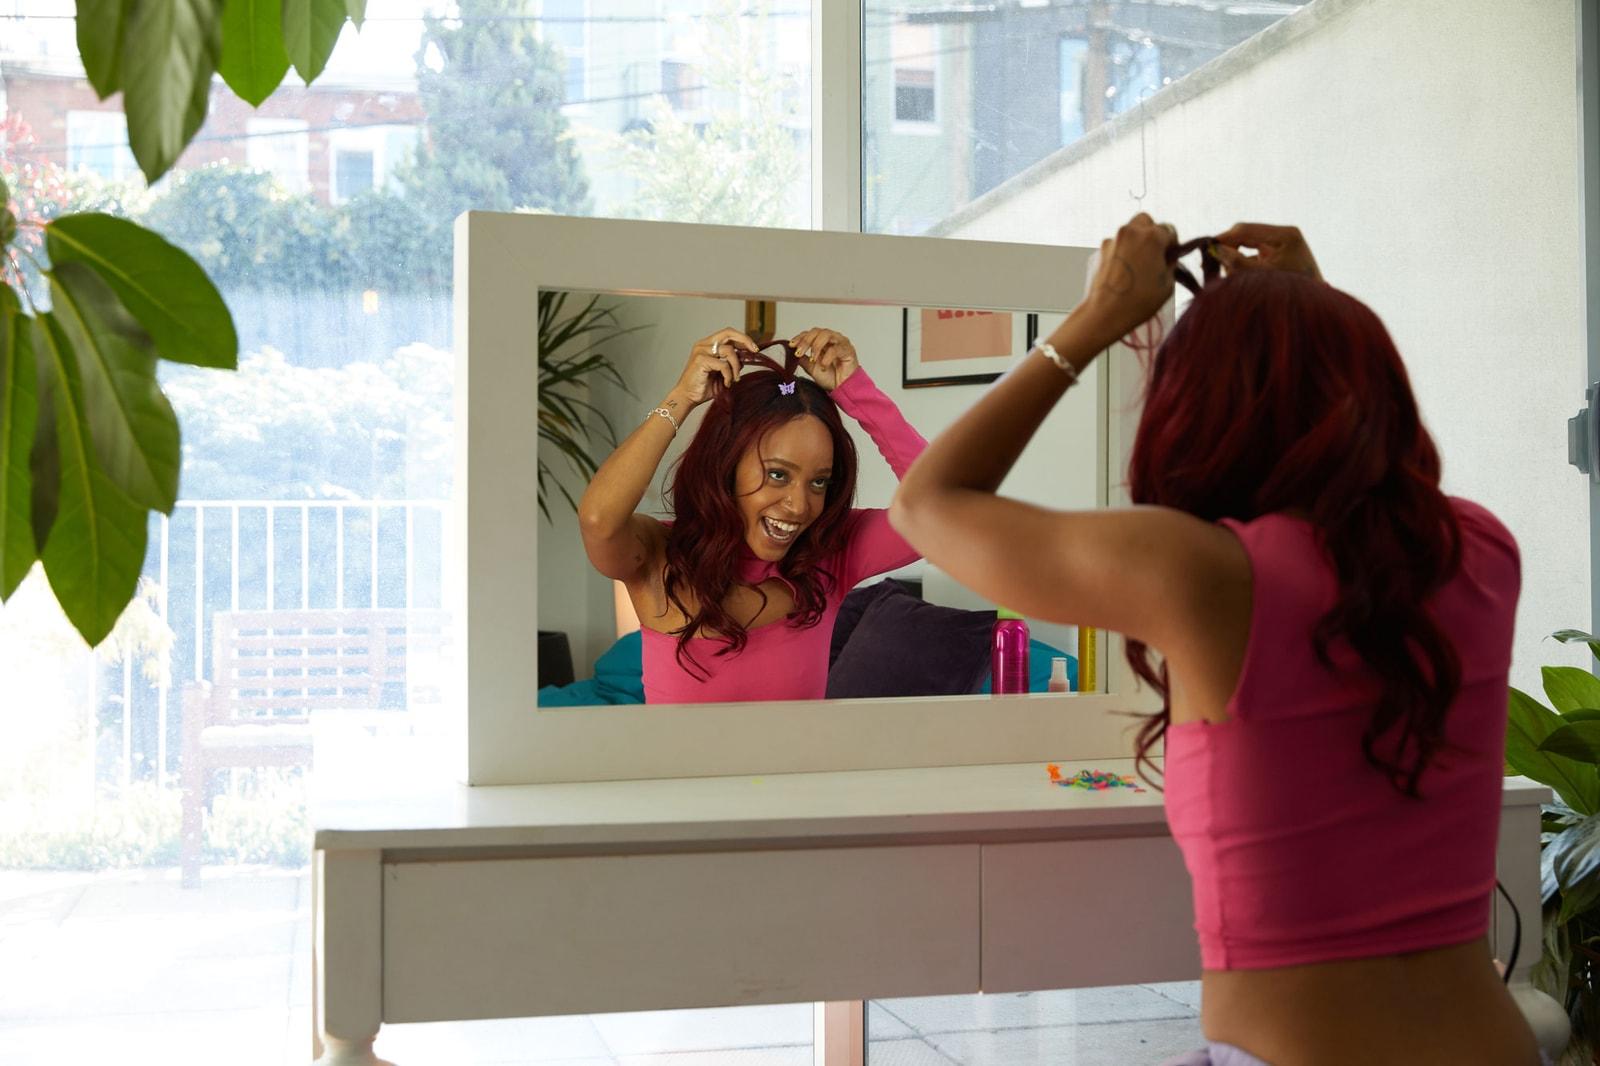 female dj duo swapmeet bed head hair tutorial video